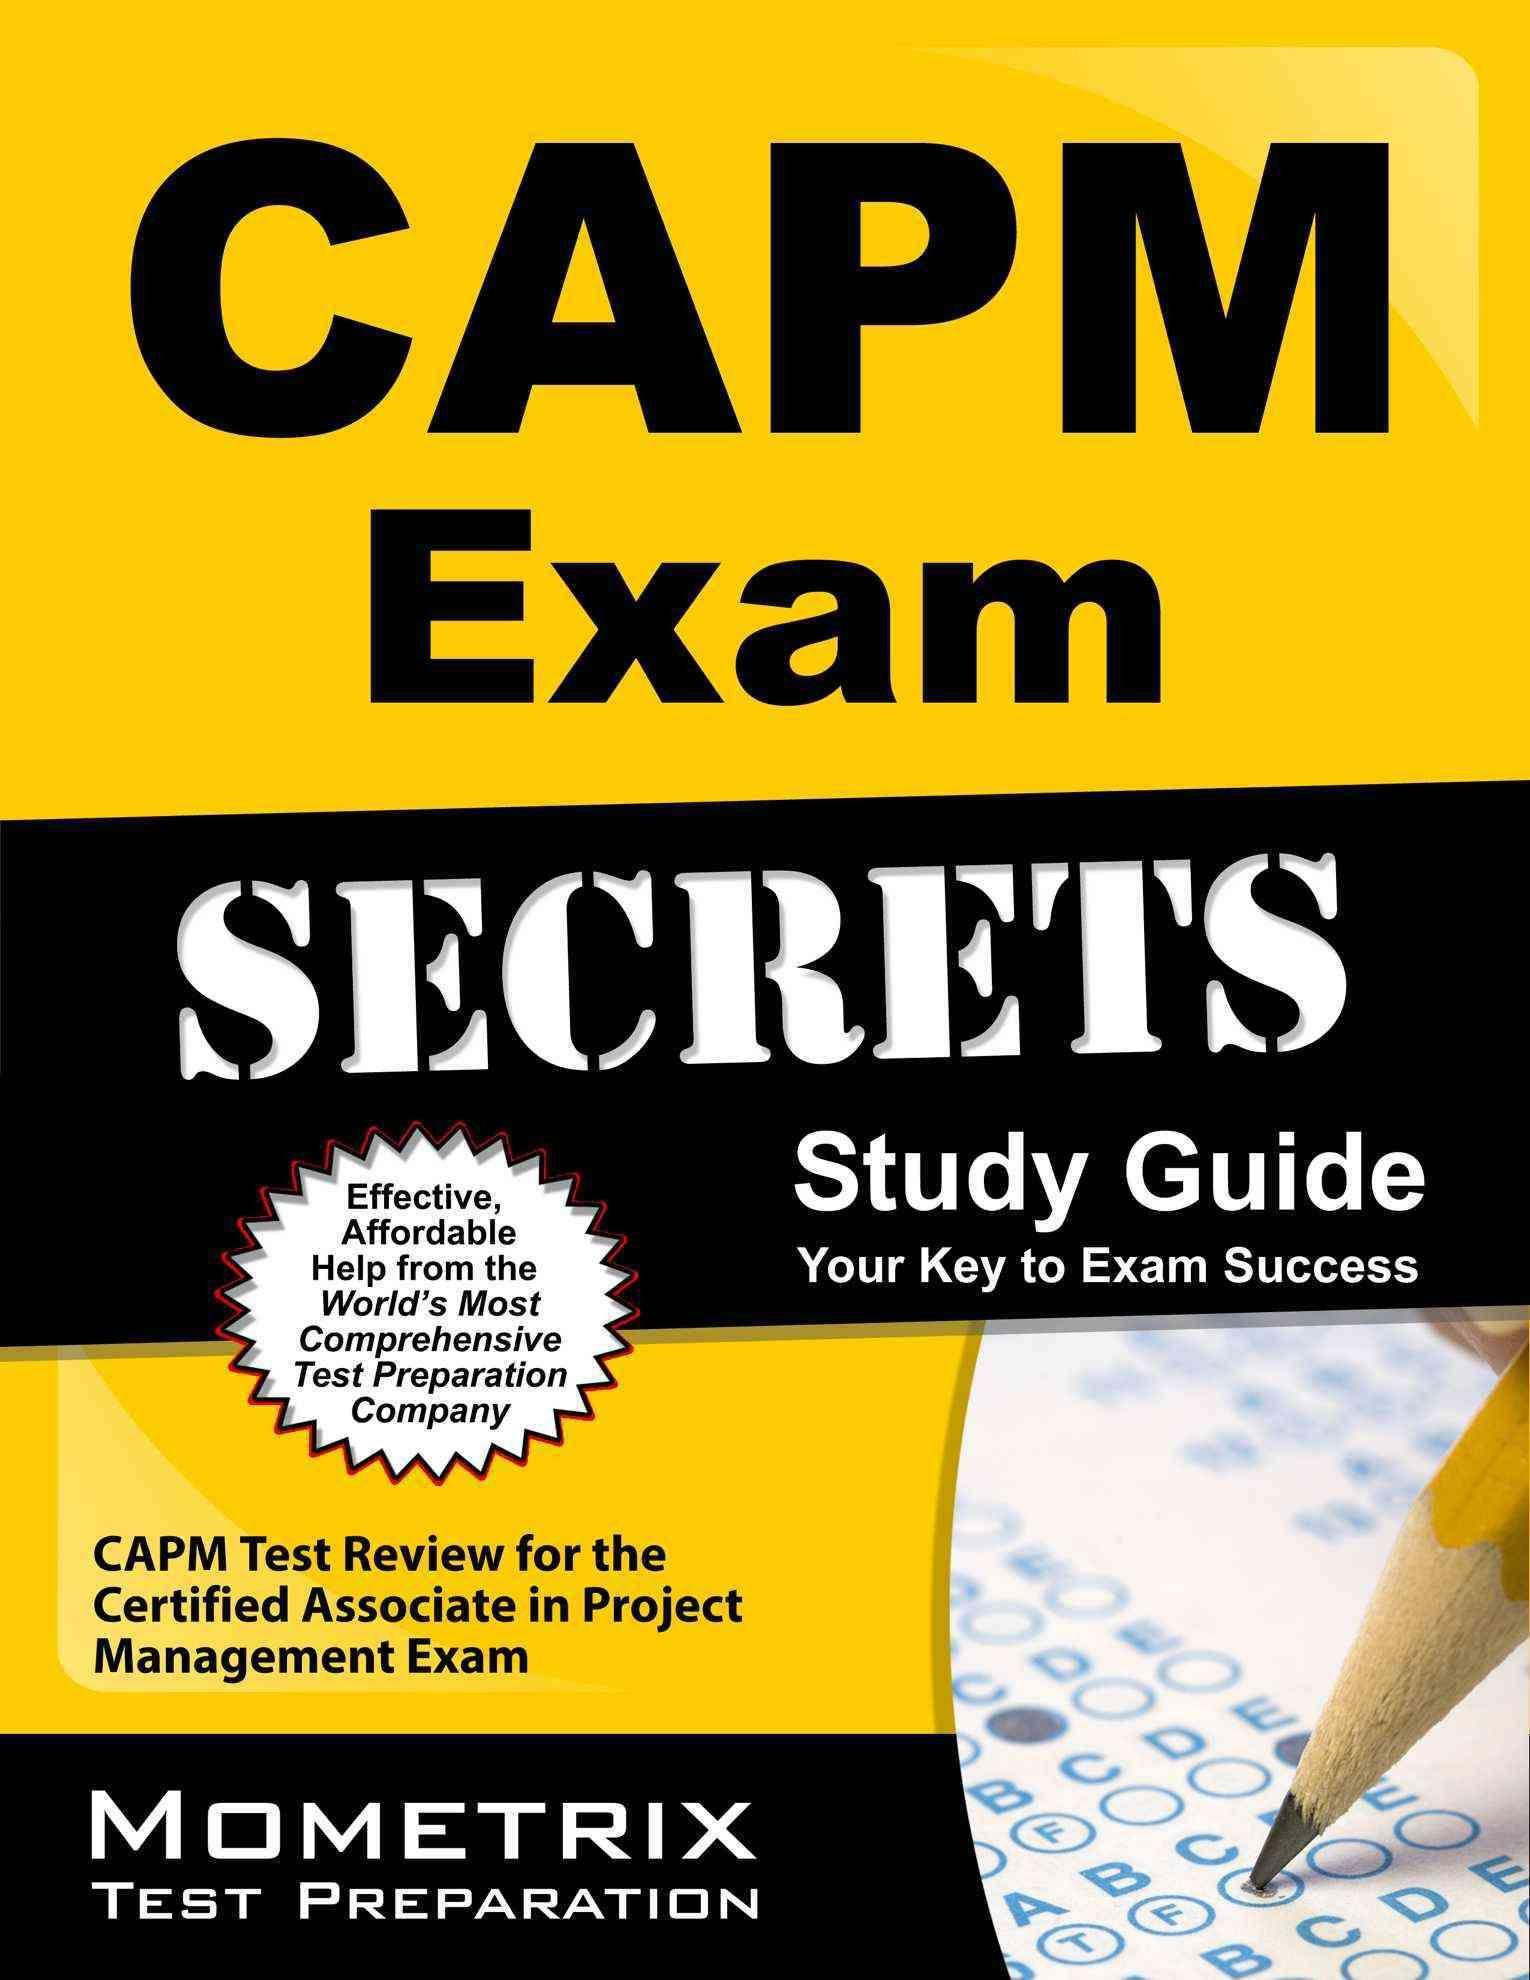 Capm exam secrets capm test review for the certified associate in capm exam secrets capm test review for the certified associate in project management exam paperback xflitez Gallery